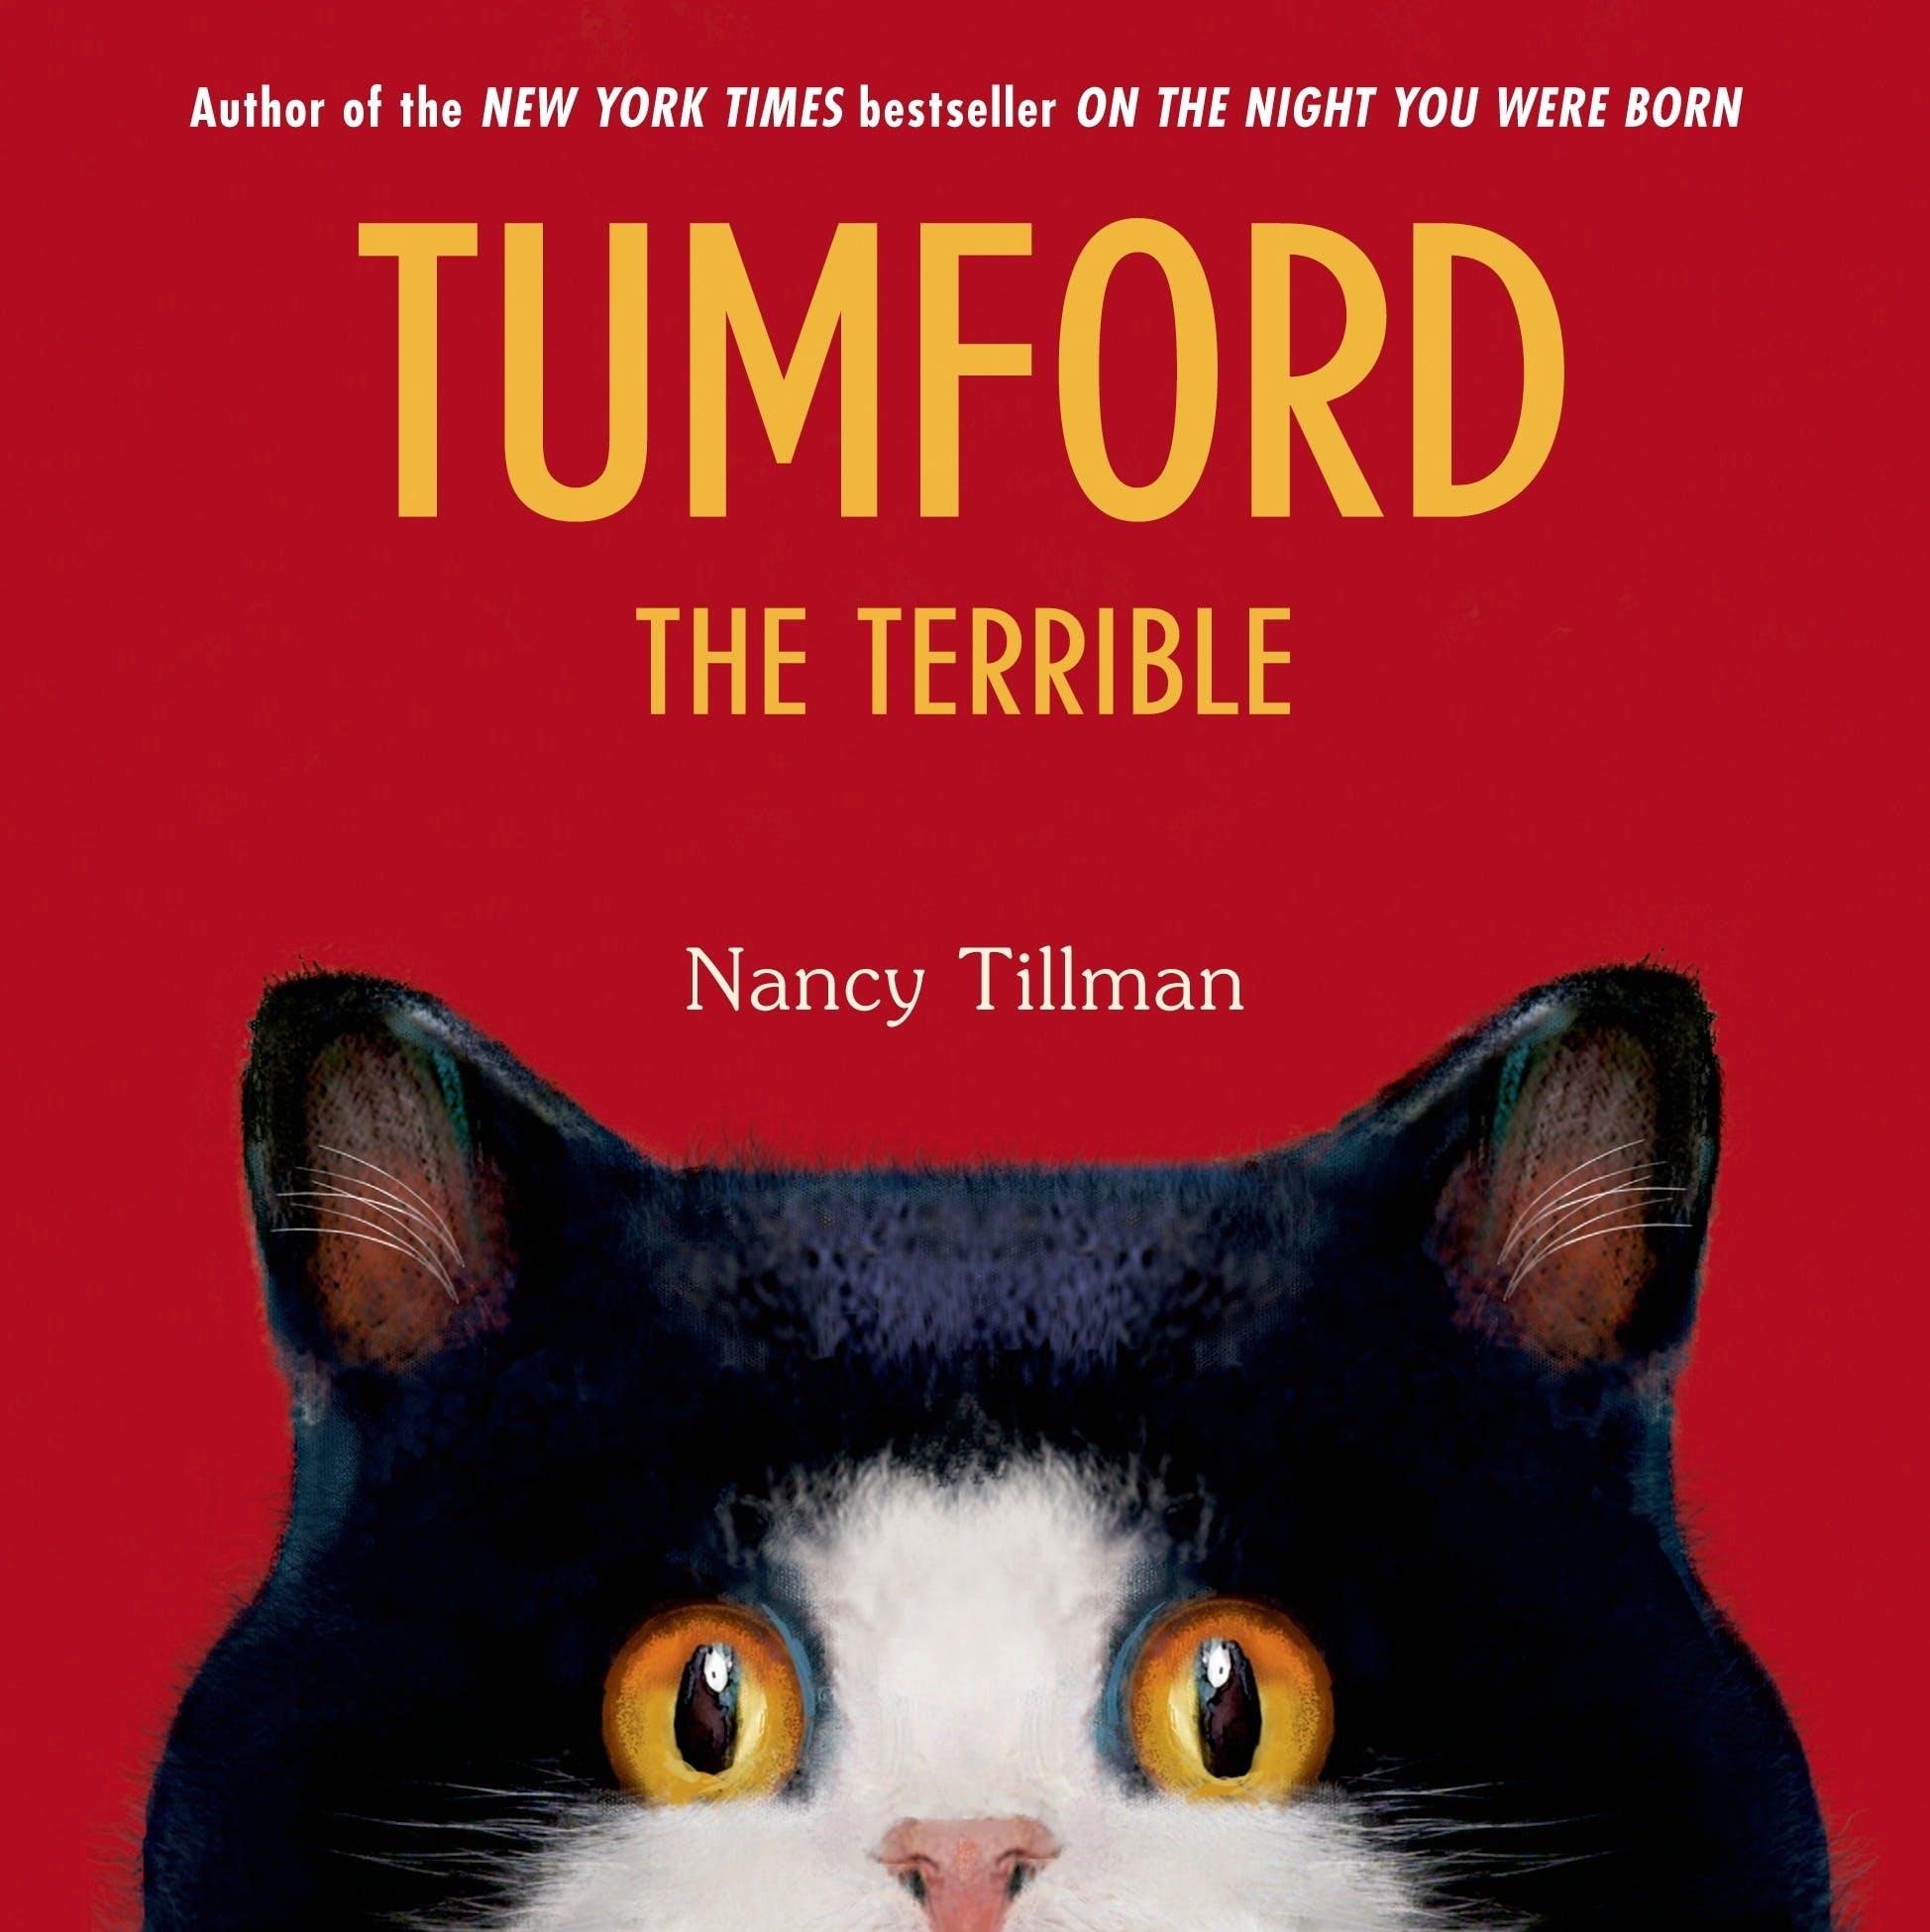 Image of Tumford the Terrible